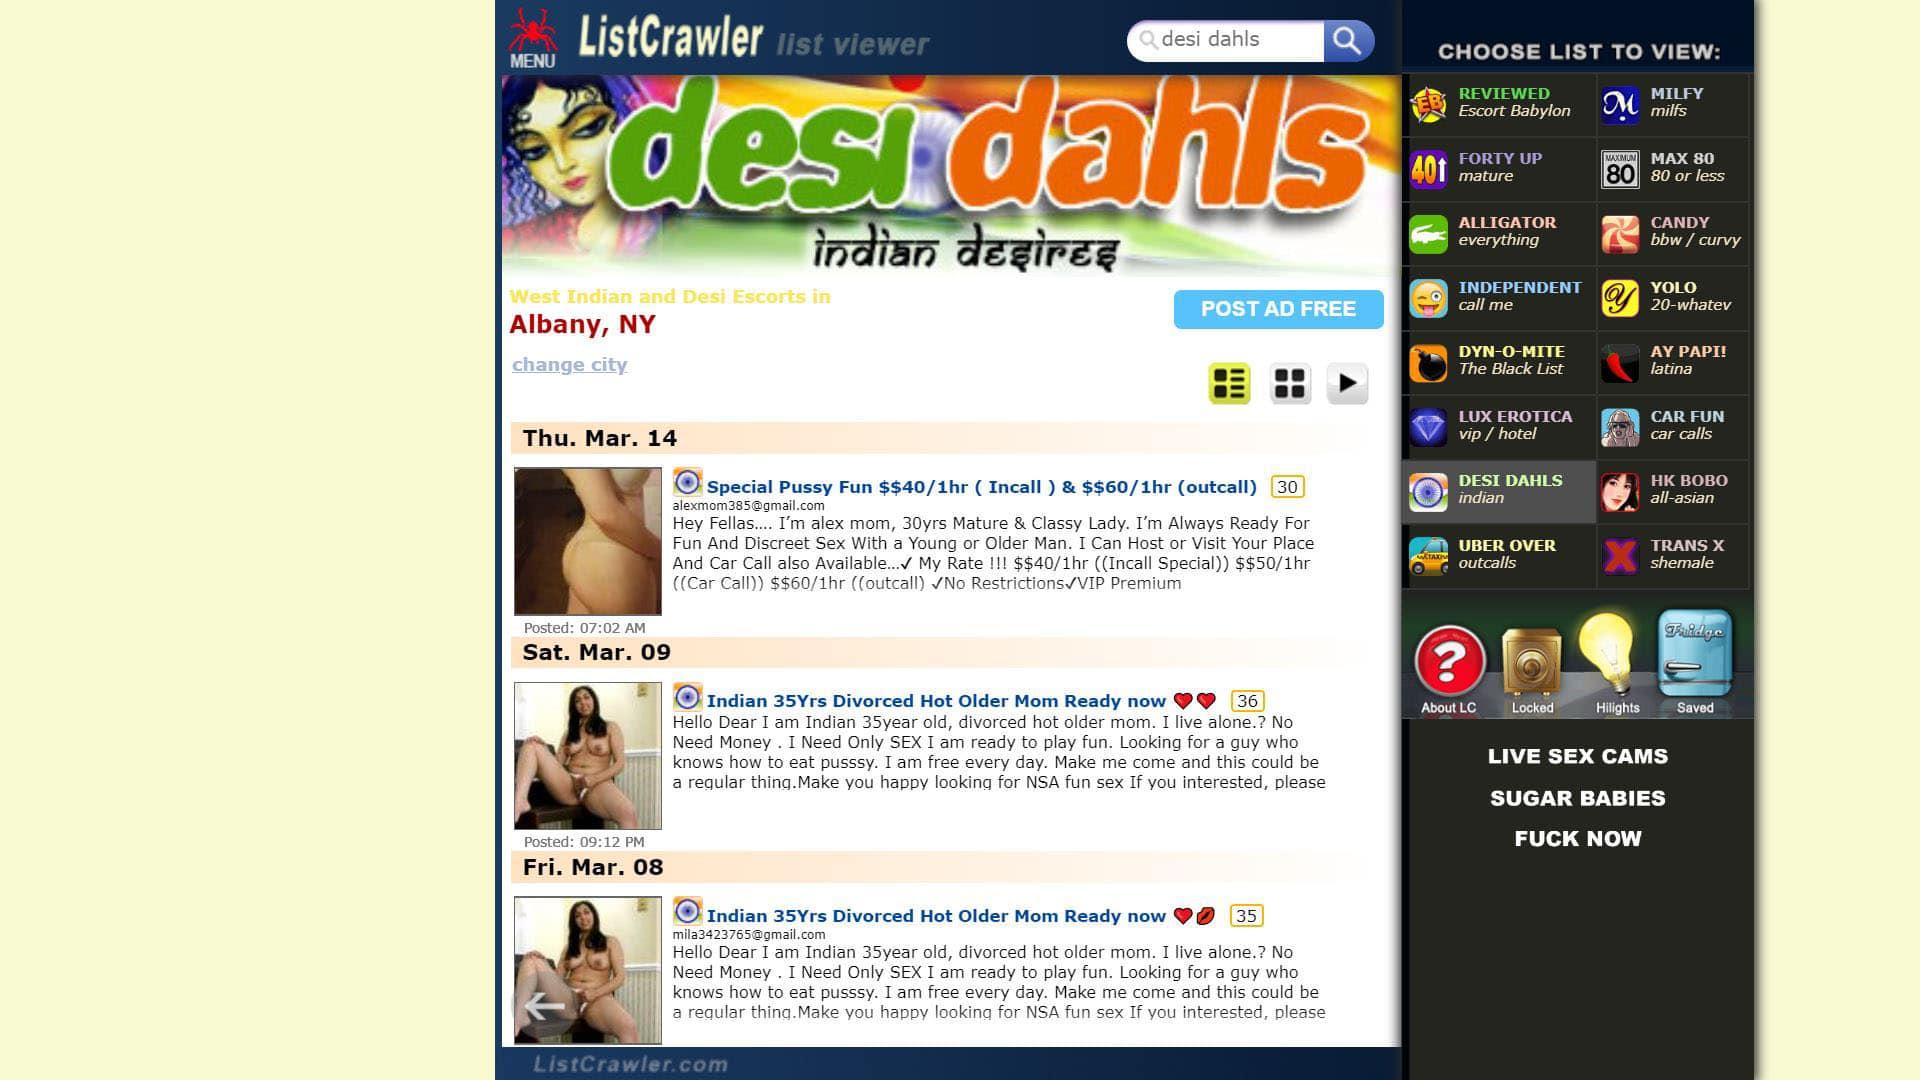 Listcrawler Escorts in Desi Dahls